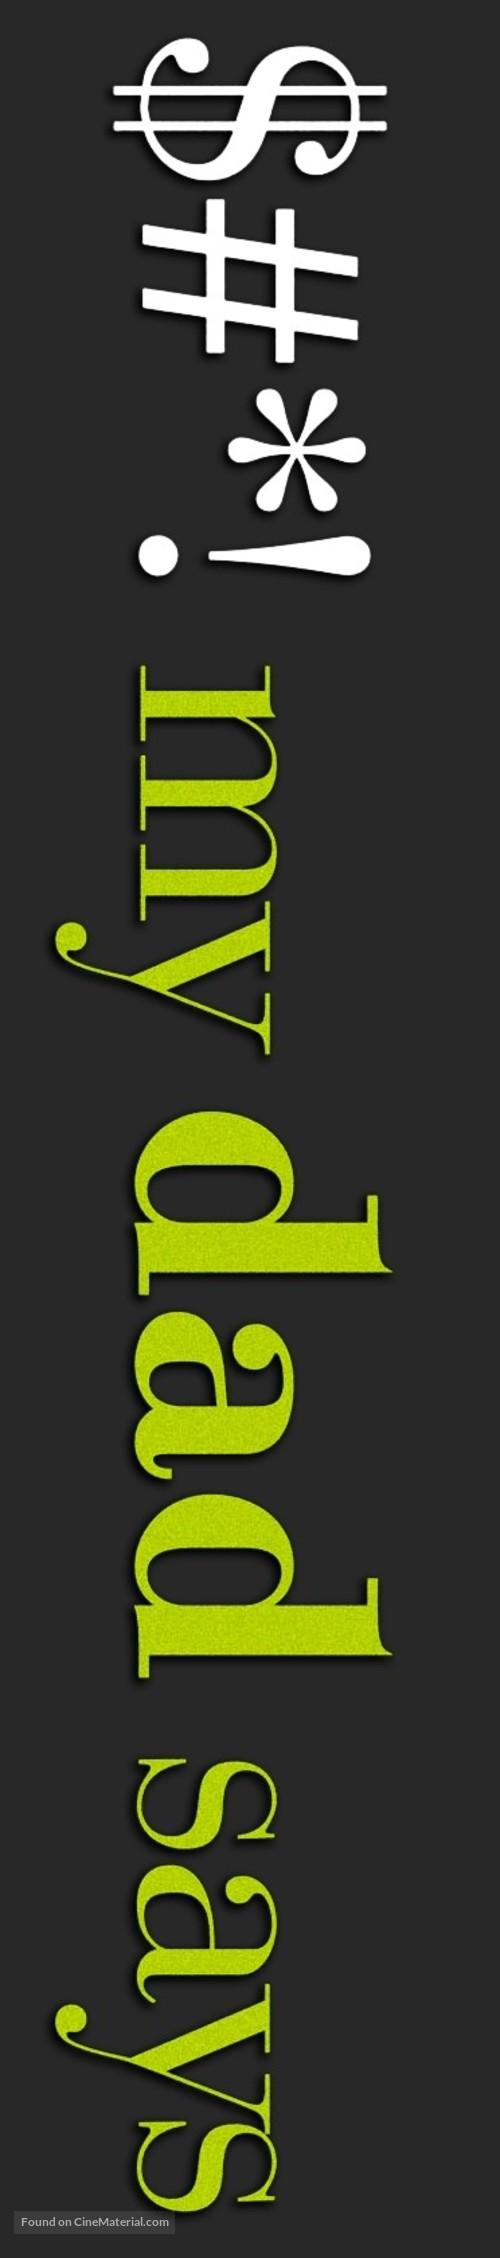 """$#*! My Dad Says"" - Logo"